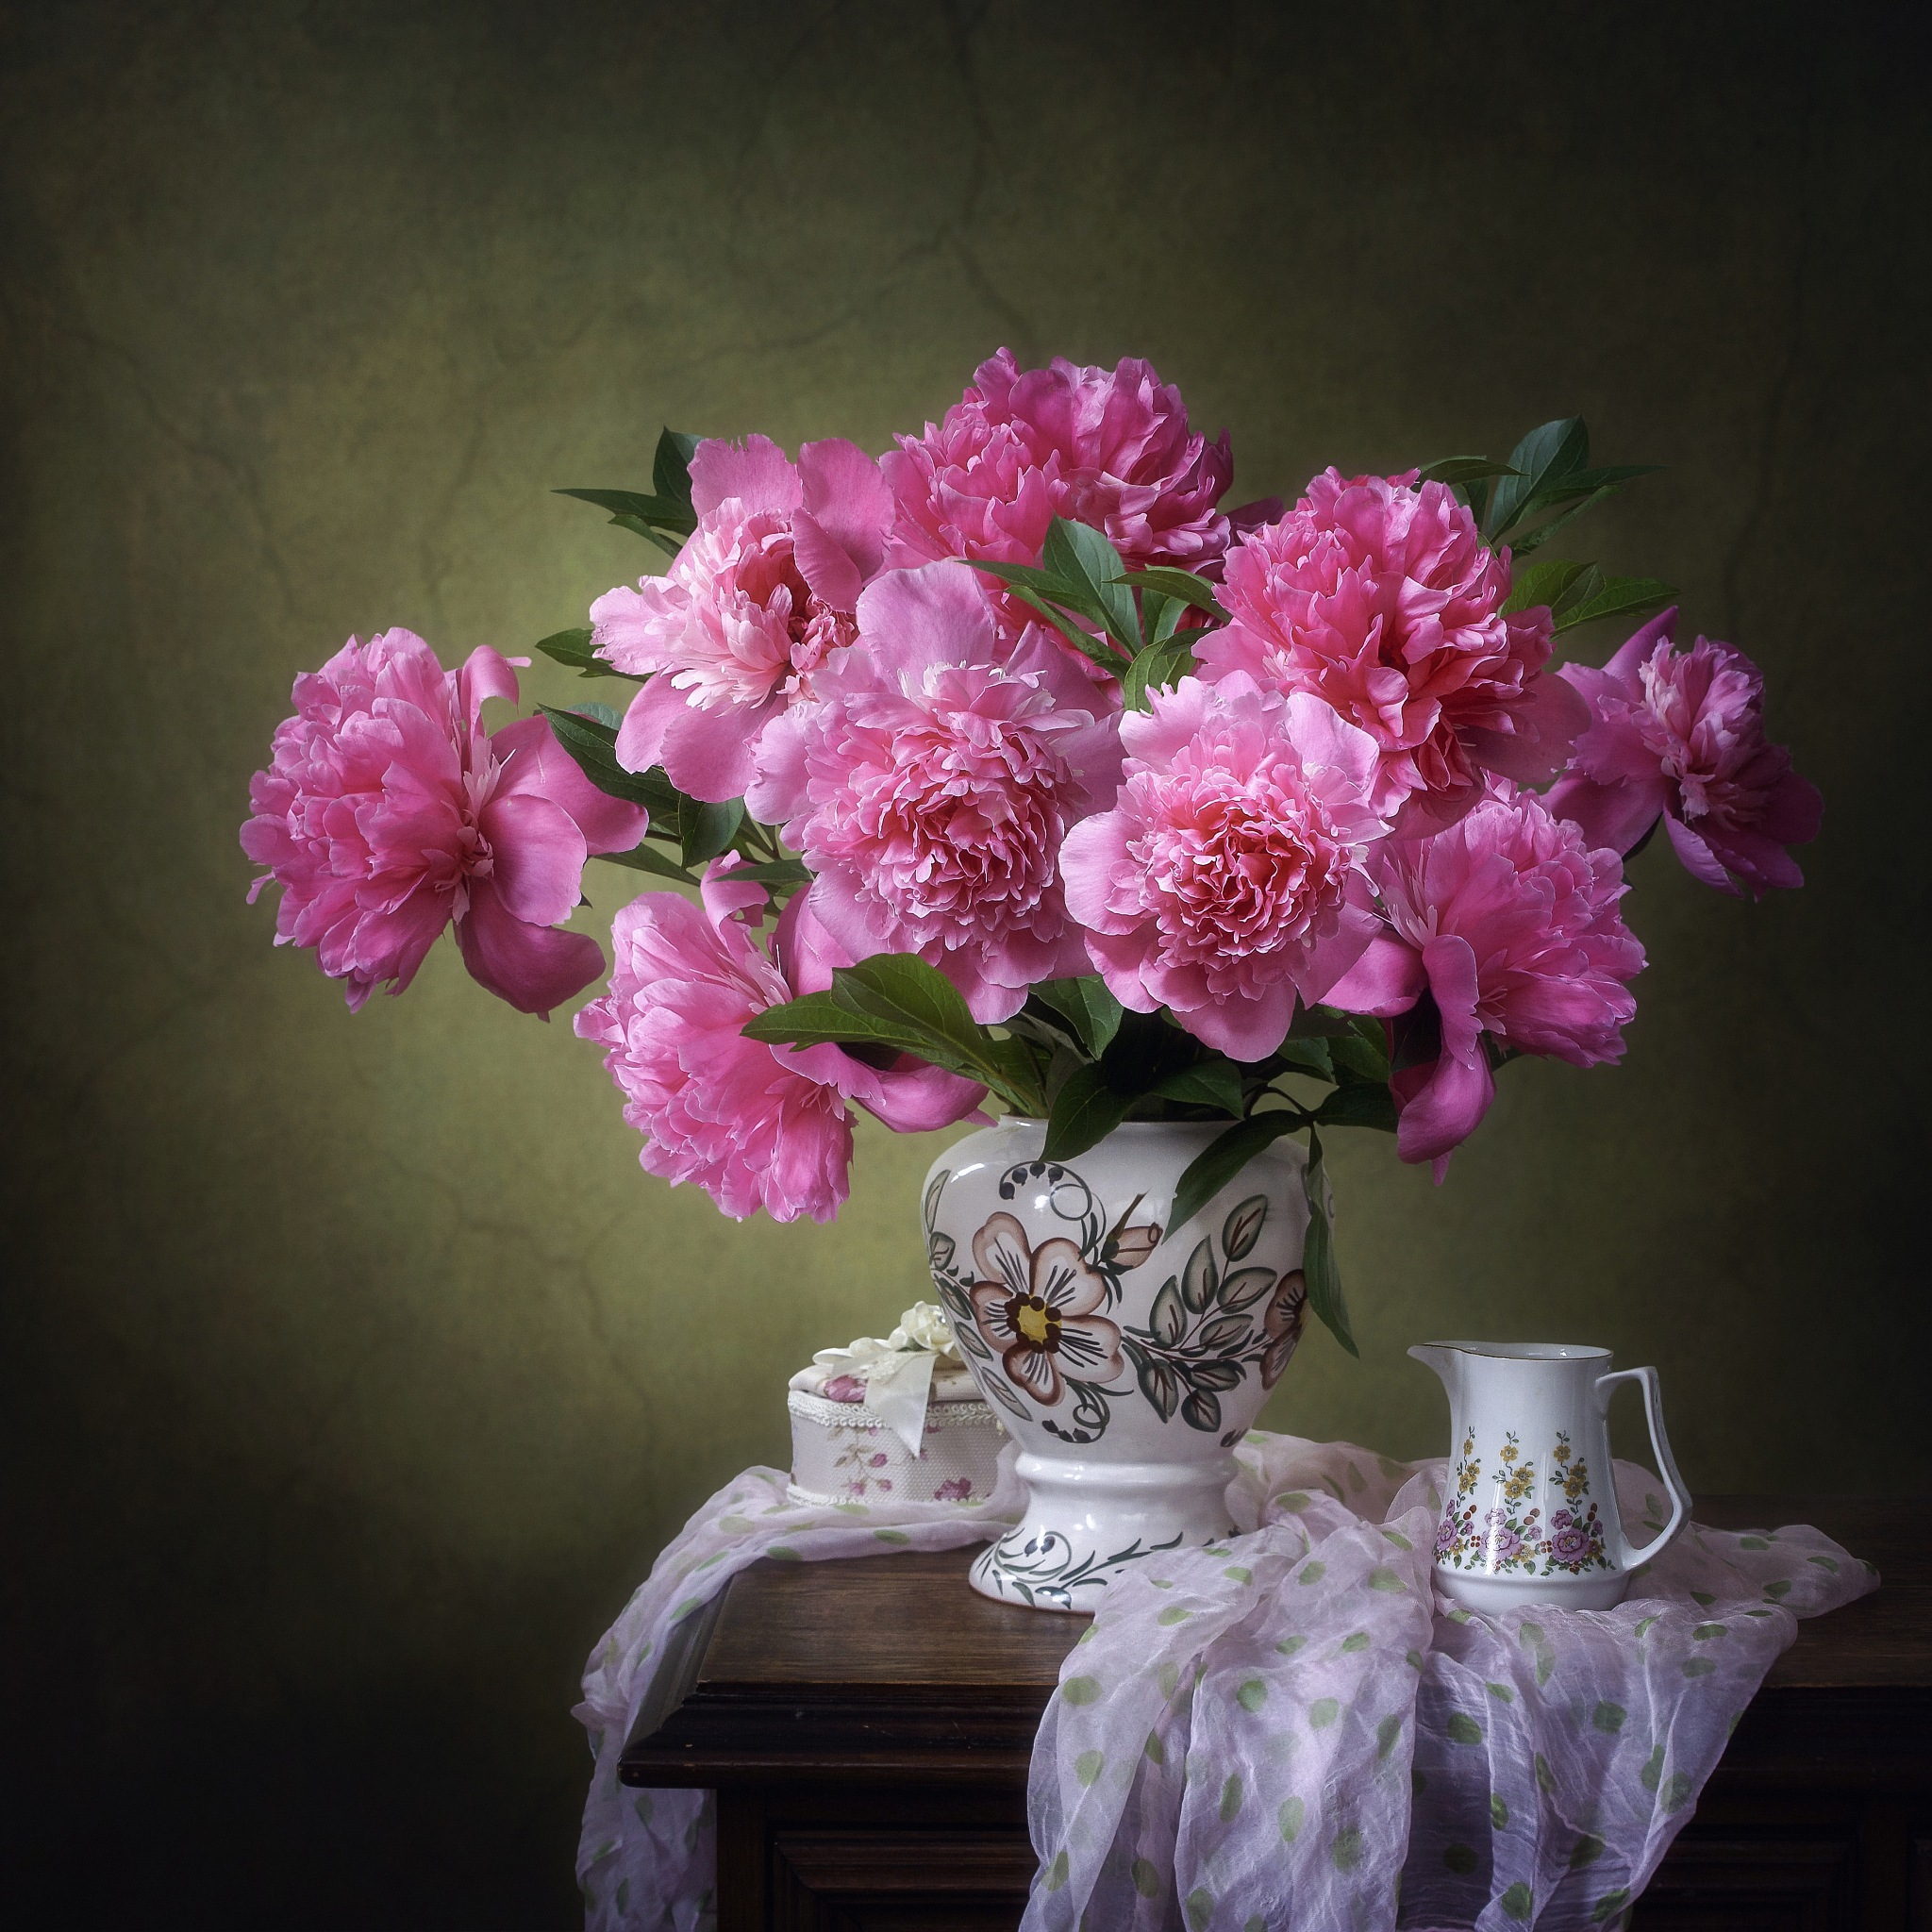 About pink peonies by Prikhodko Irina